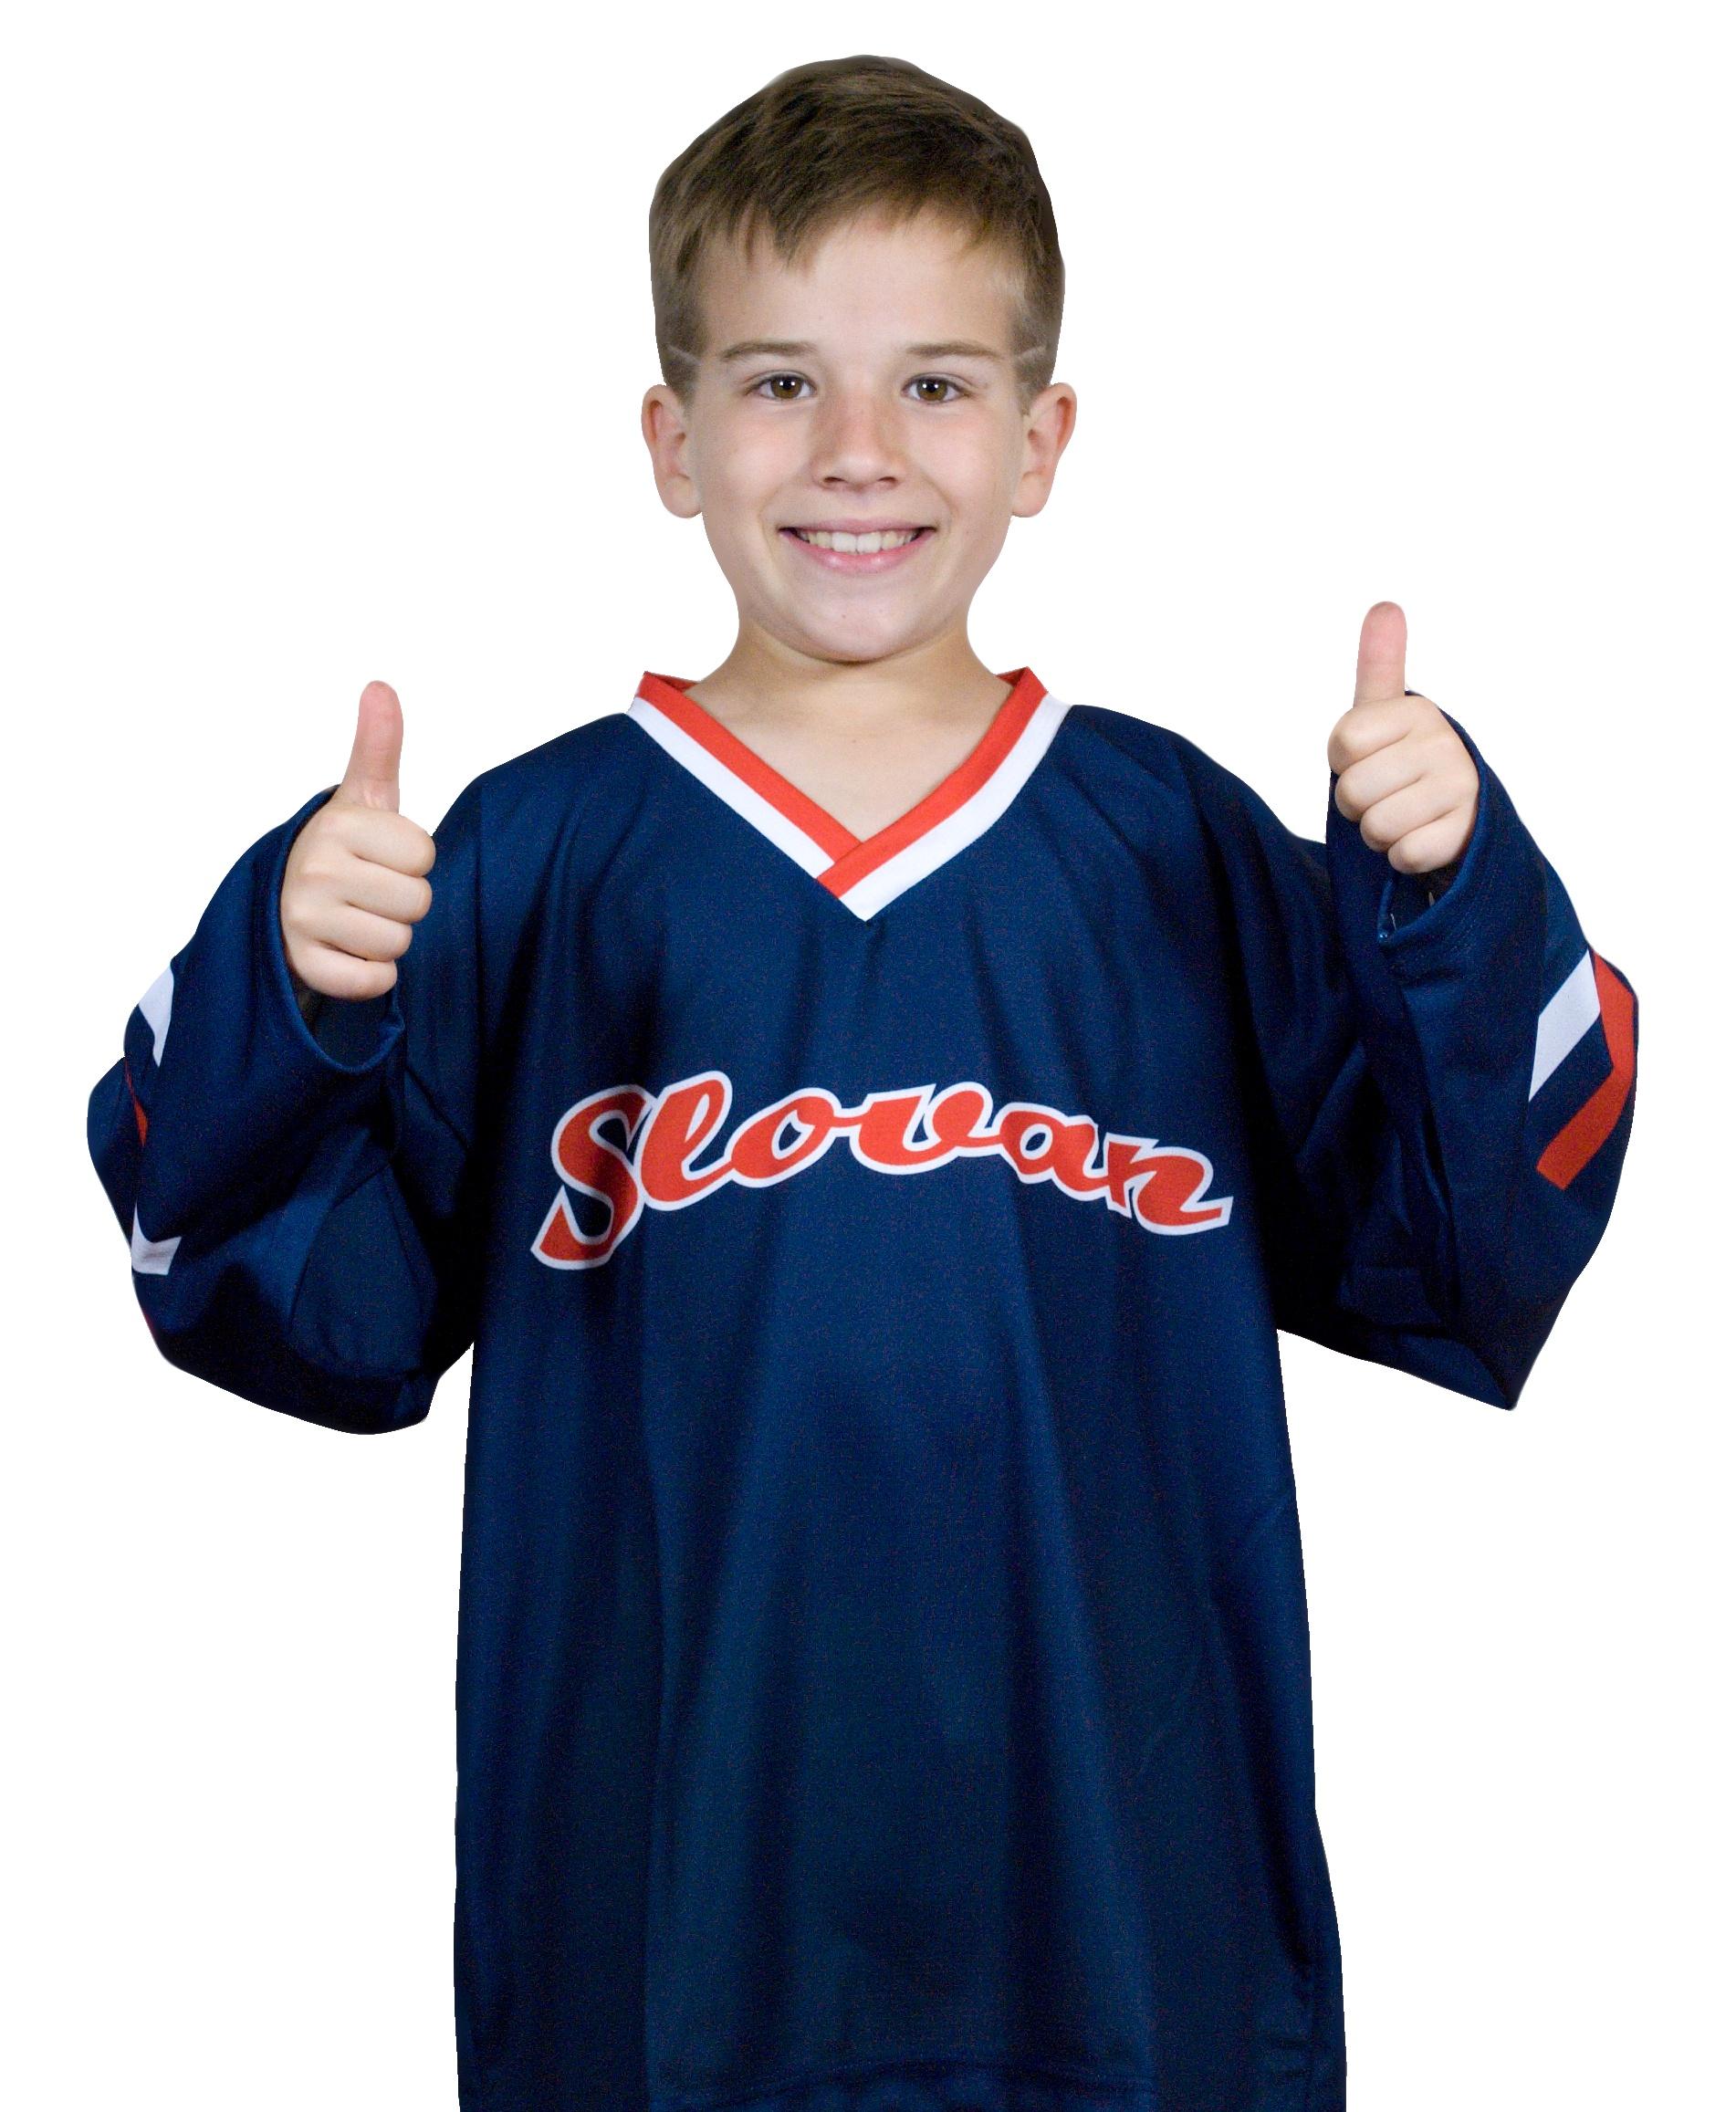 b2e6f45d76900 Hokejový dres Slovan nápis modrý DETSKÝ - Fanshop SB